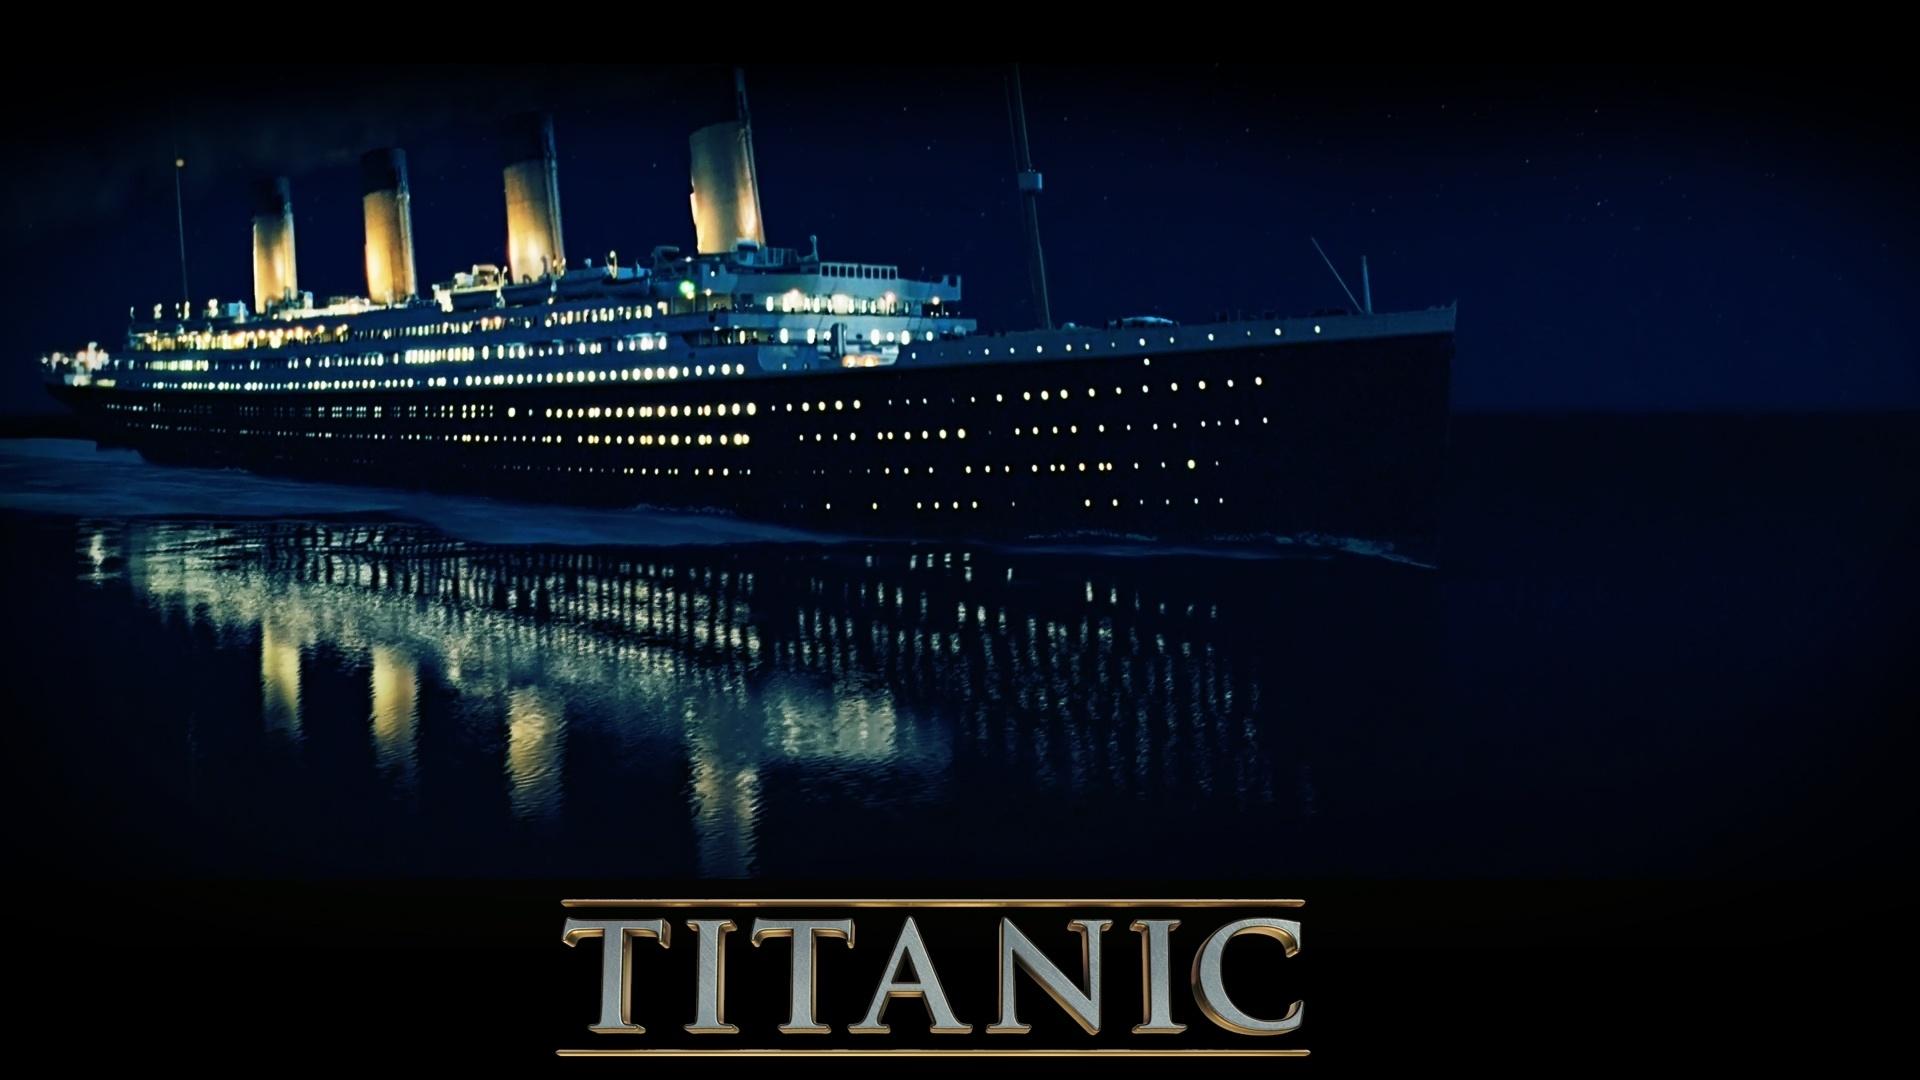 titanic_ship-1920x1080.jpg